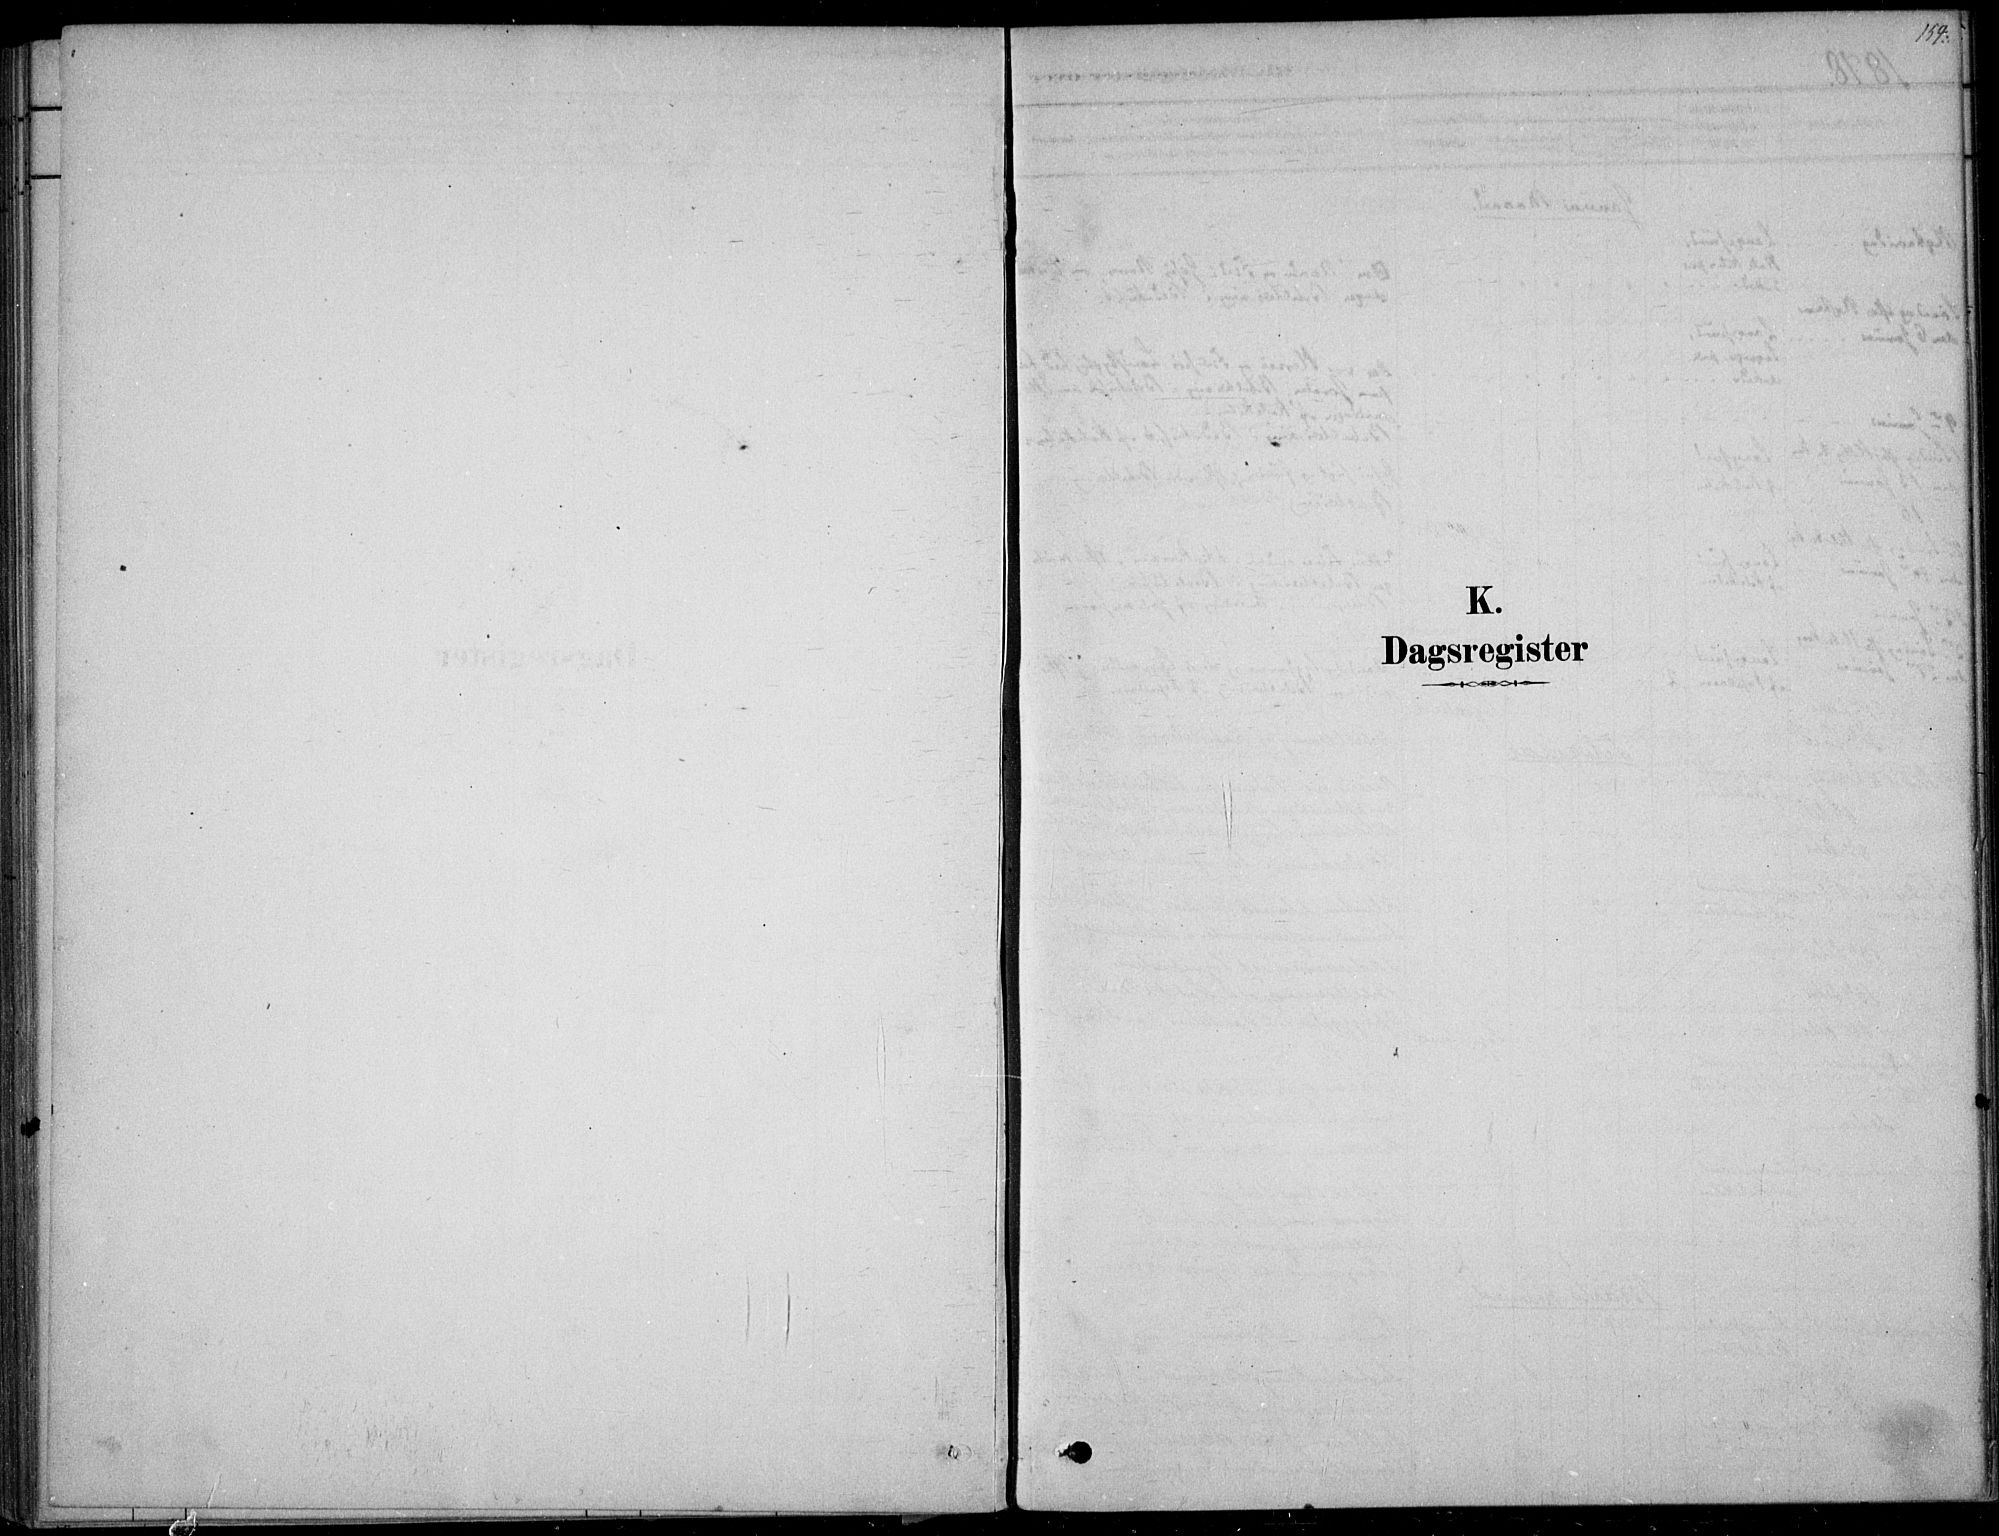 SAKO, Langesund kirkebøker, F/Fa/L0002: Ministerialbok nr. 2, 1878-1892, s. 154